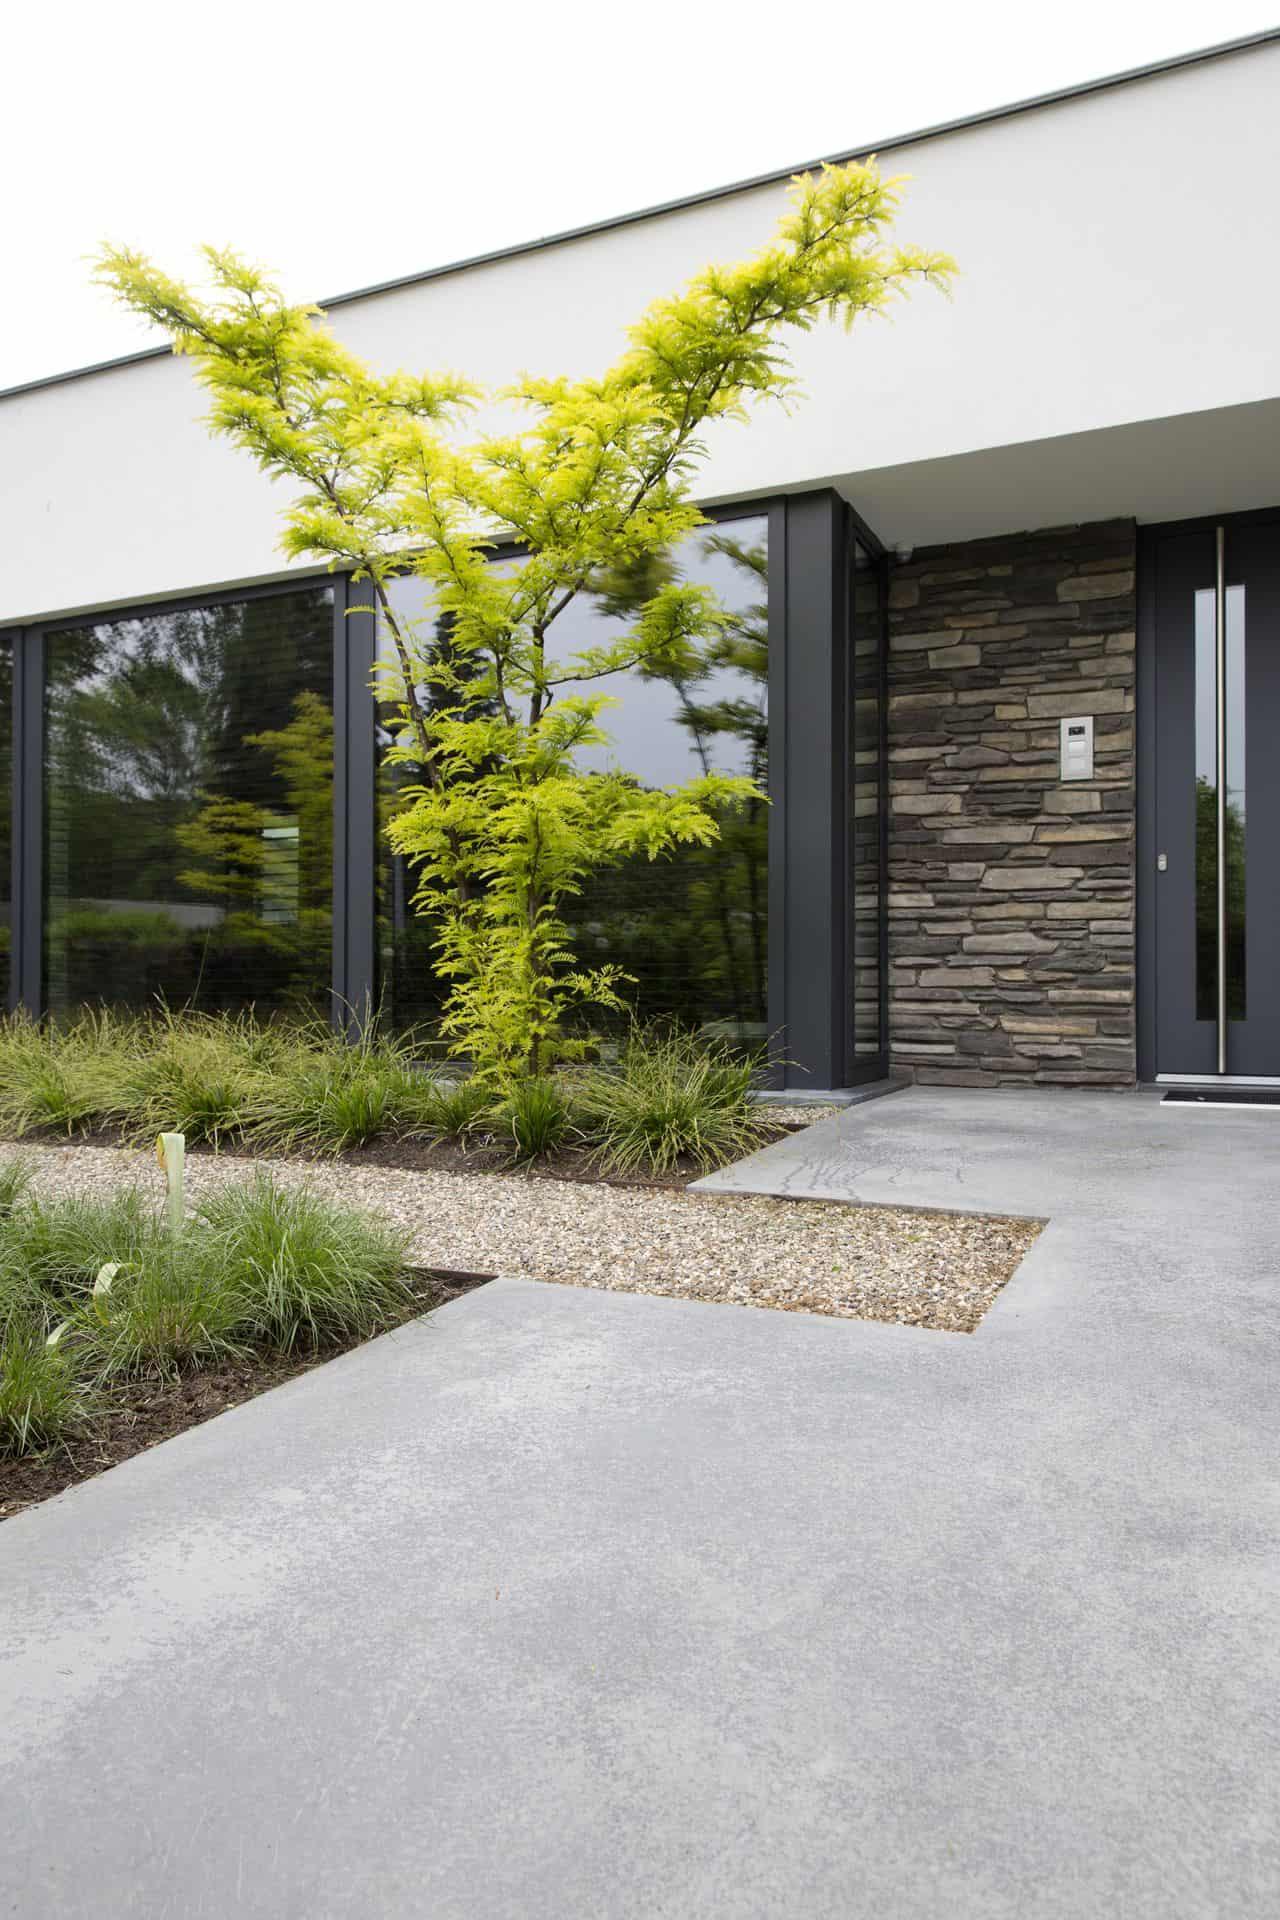 gevlinderde betonnen inrit, gevlinderd betonnen terras